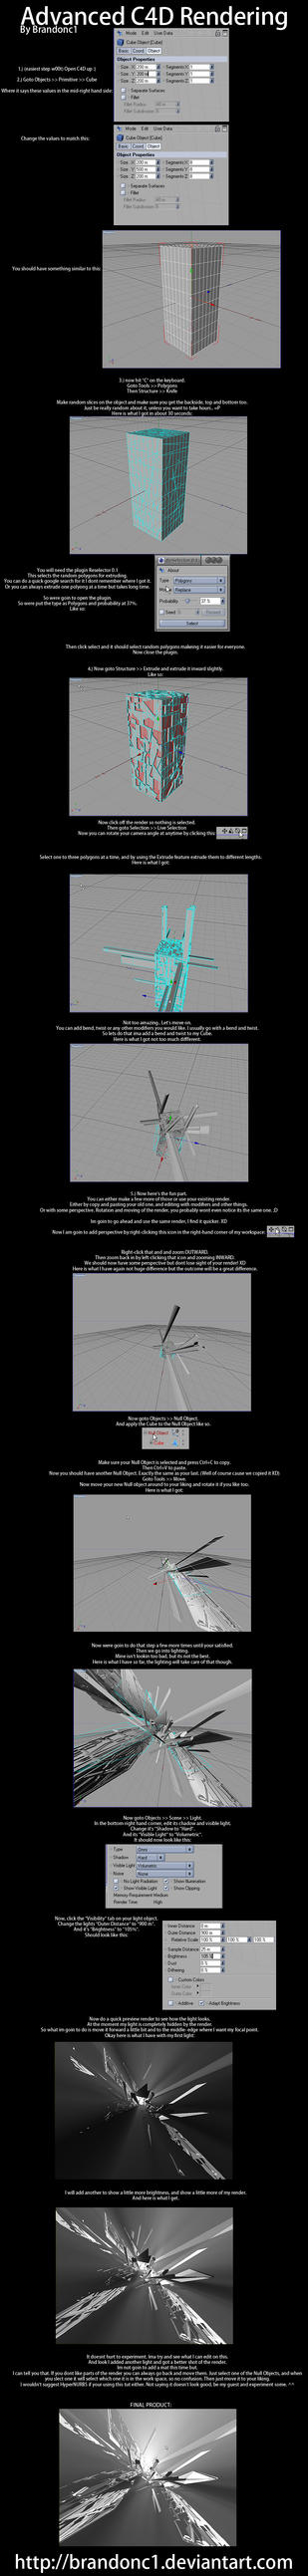 C4D Extreme Tutorial by Brandonc1